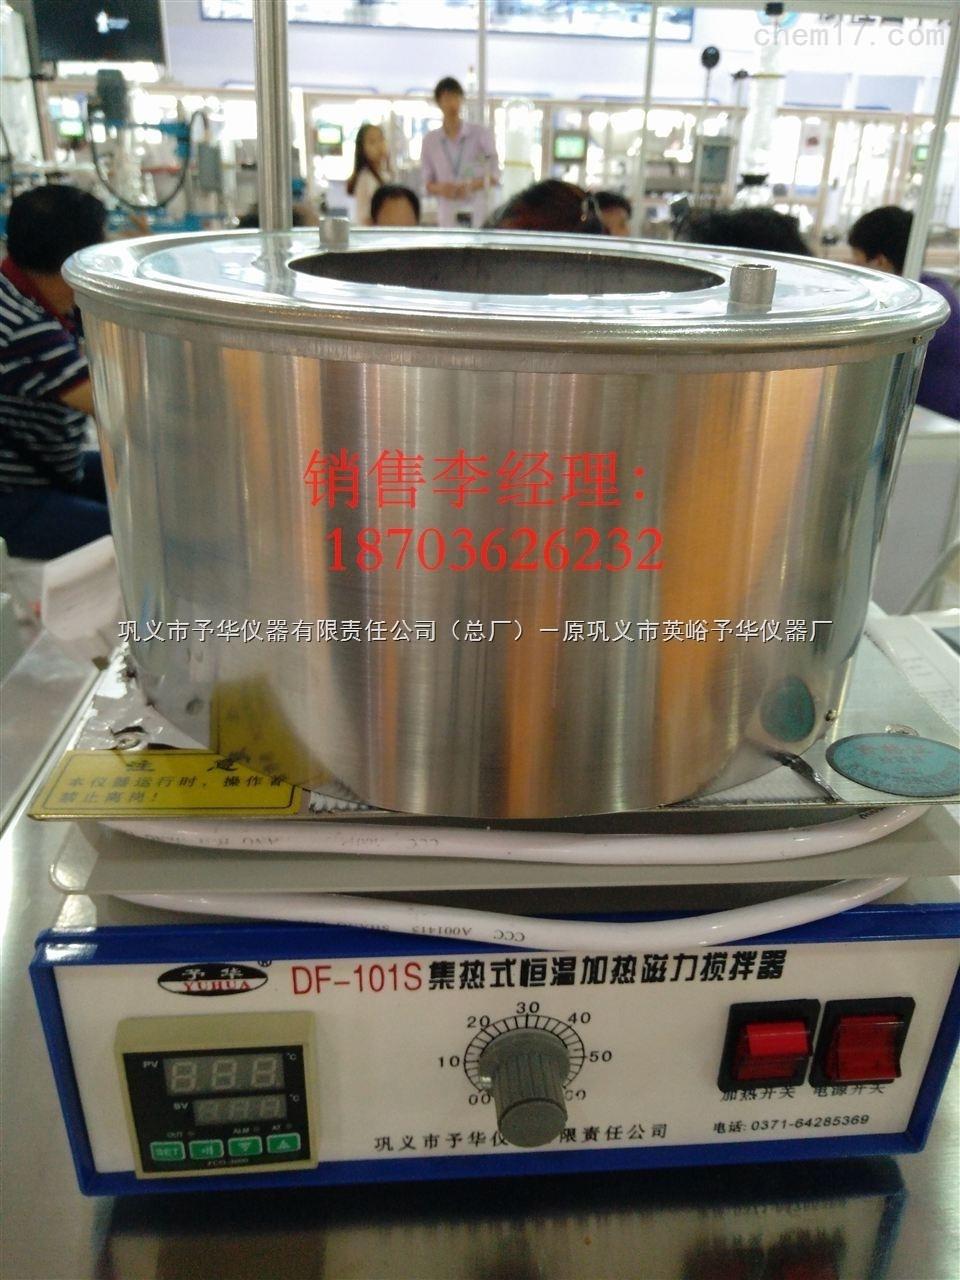 DF-101S集热式磁力搅拌器(巩义予华厂家直销)